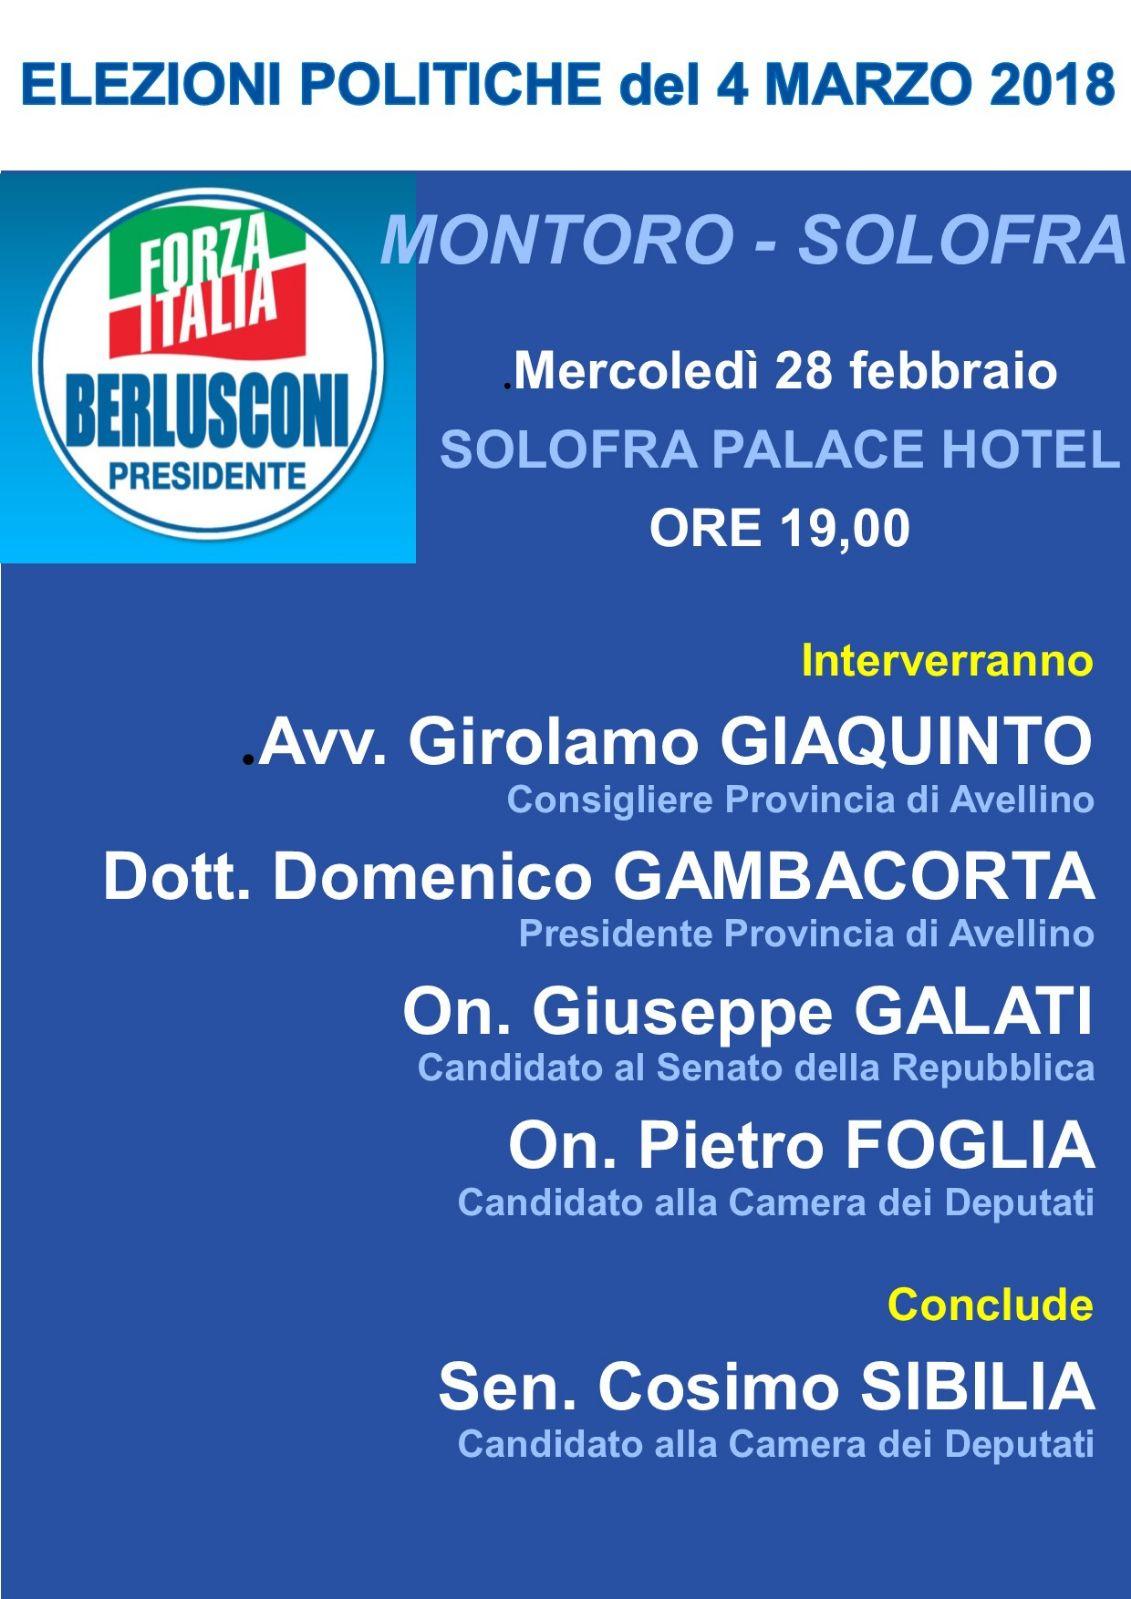 forza italia 28 febbraio a Solofra